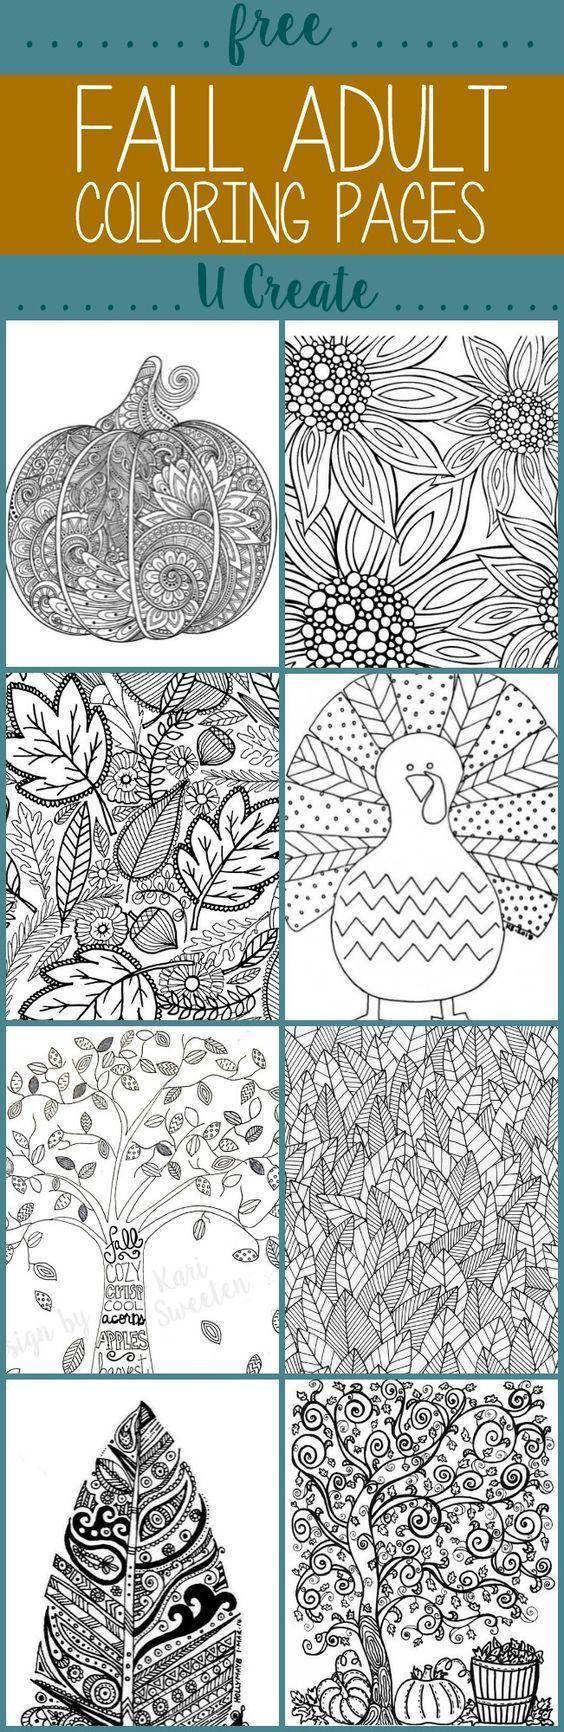 354 besten I Love Coloring! Bilder auf Pinterest | Frei bedruckbar ...